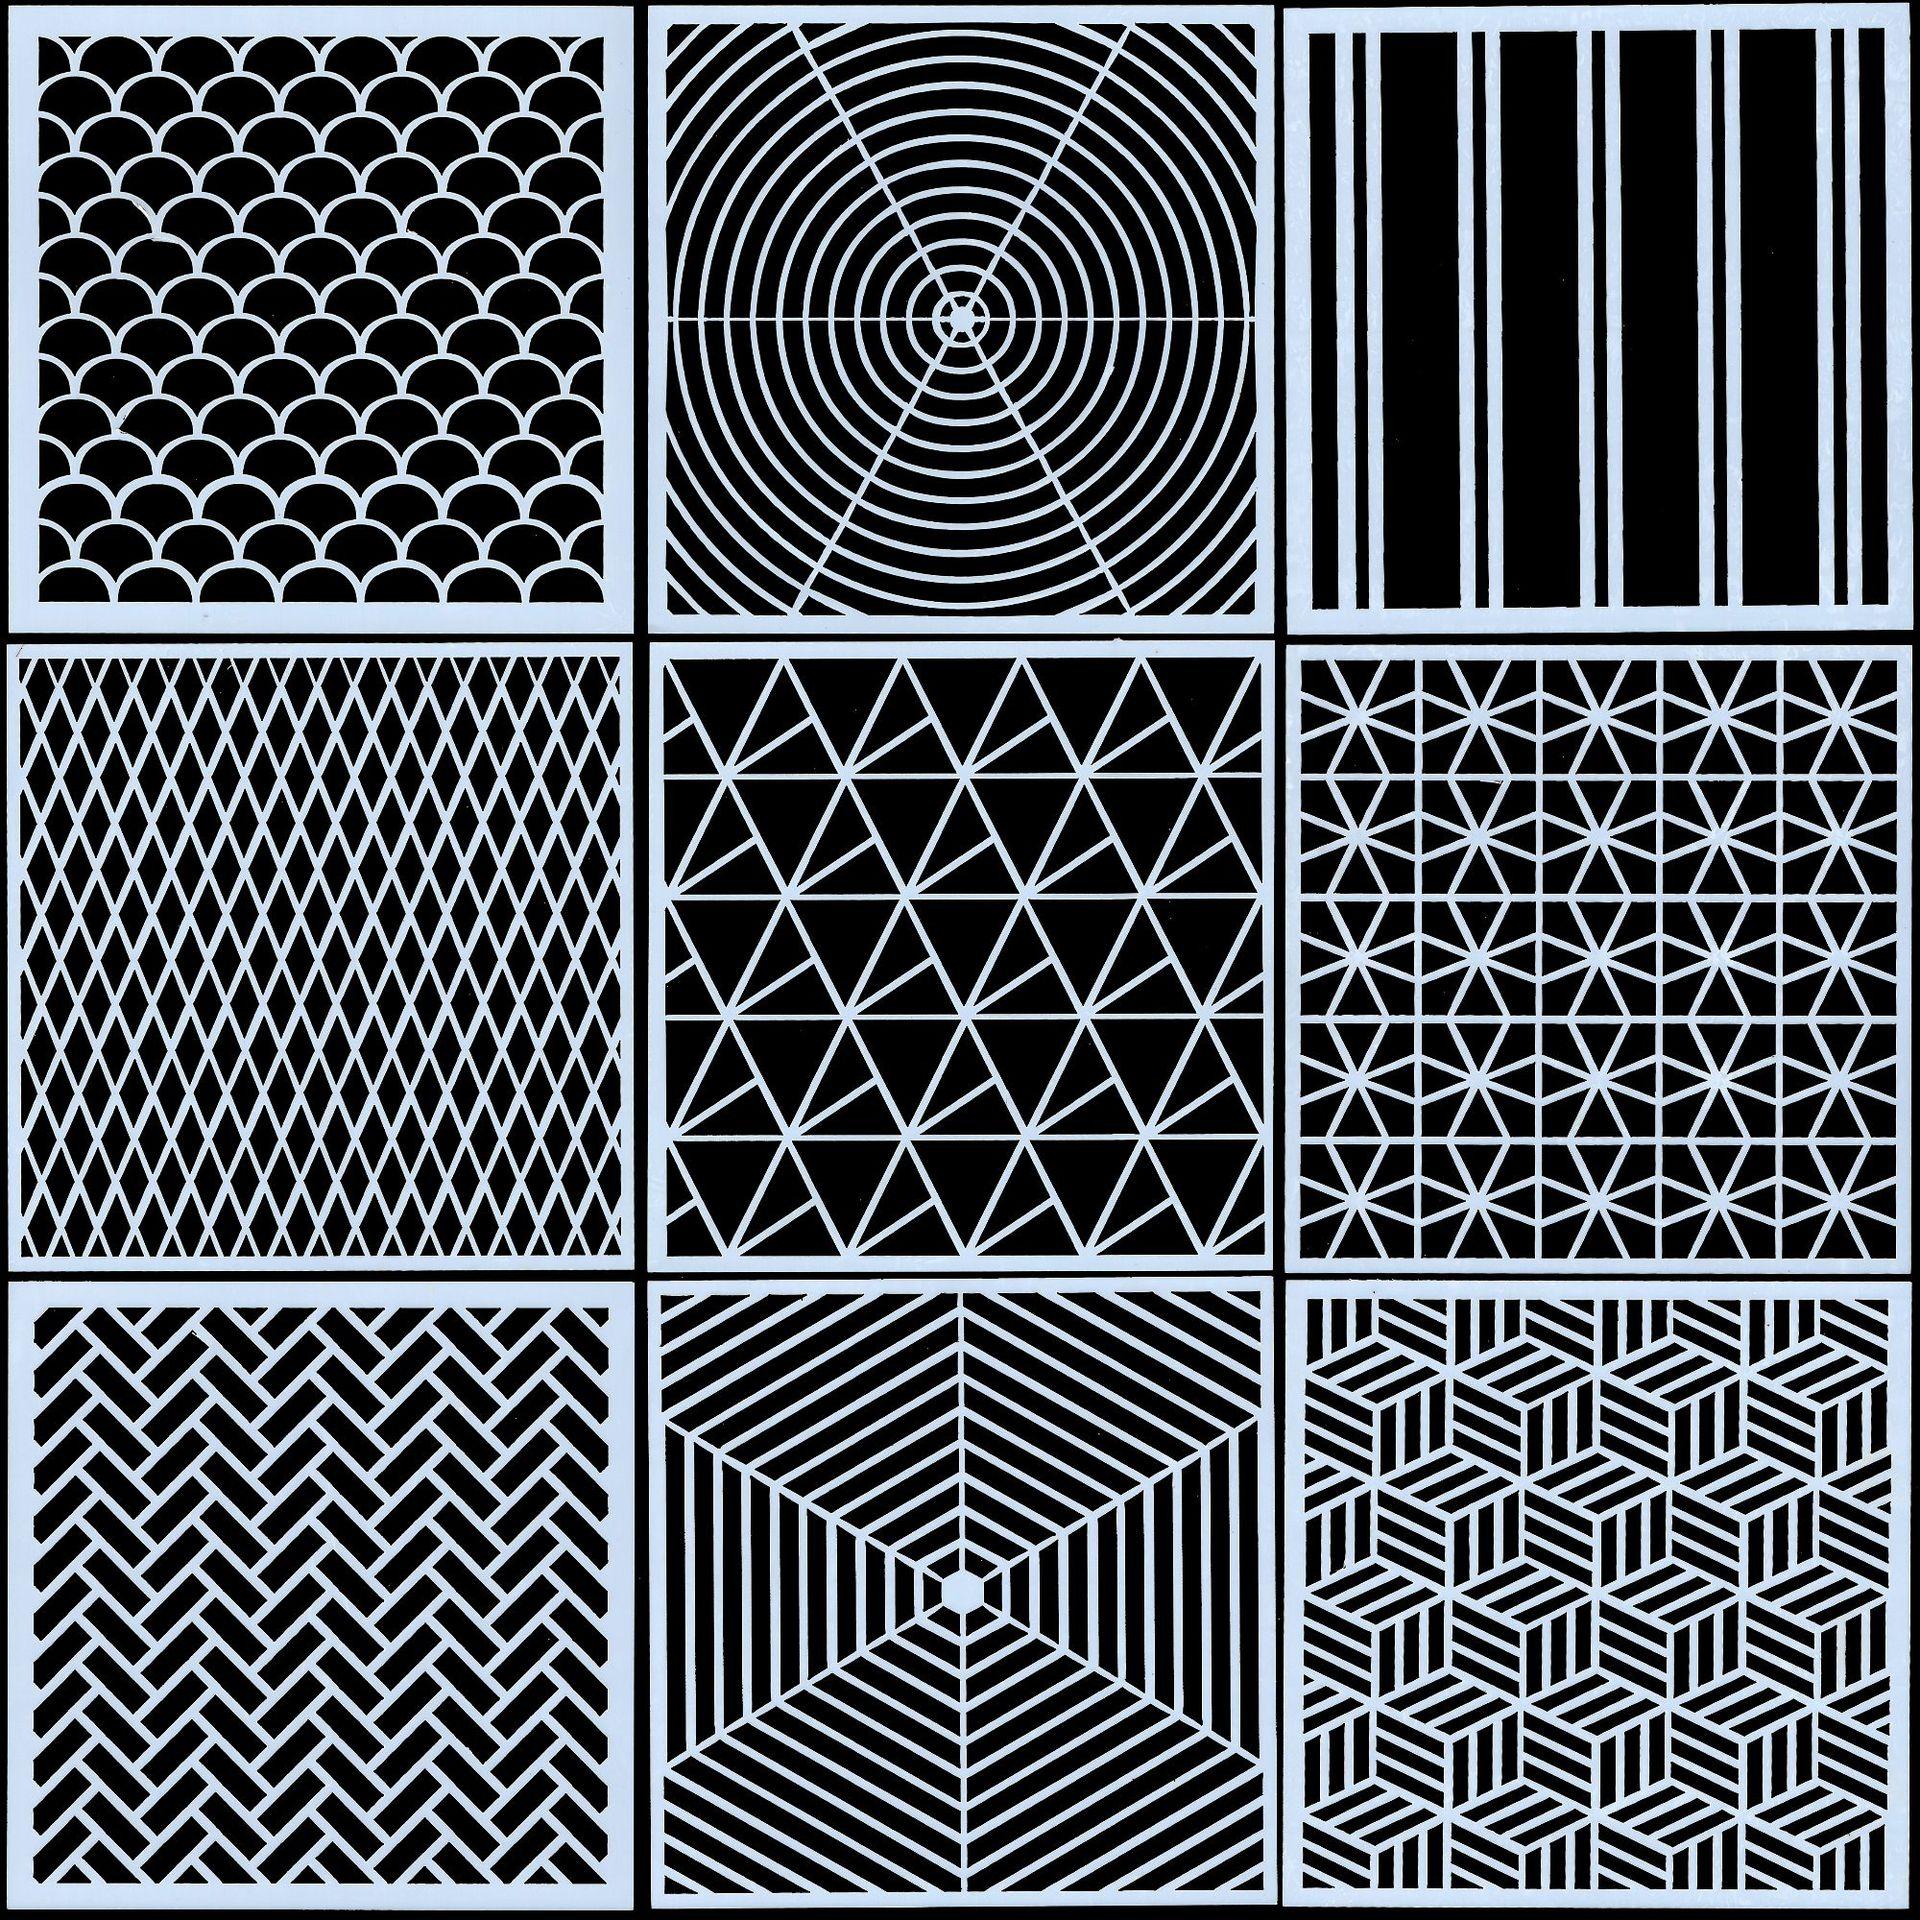 9Pcs/Set 13cm Simple Geometry Texture DIY Craft Layering Stencils Painting Scrapbooking Stamping Embossing Album Card Template